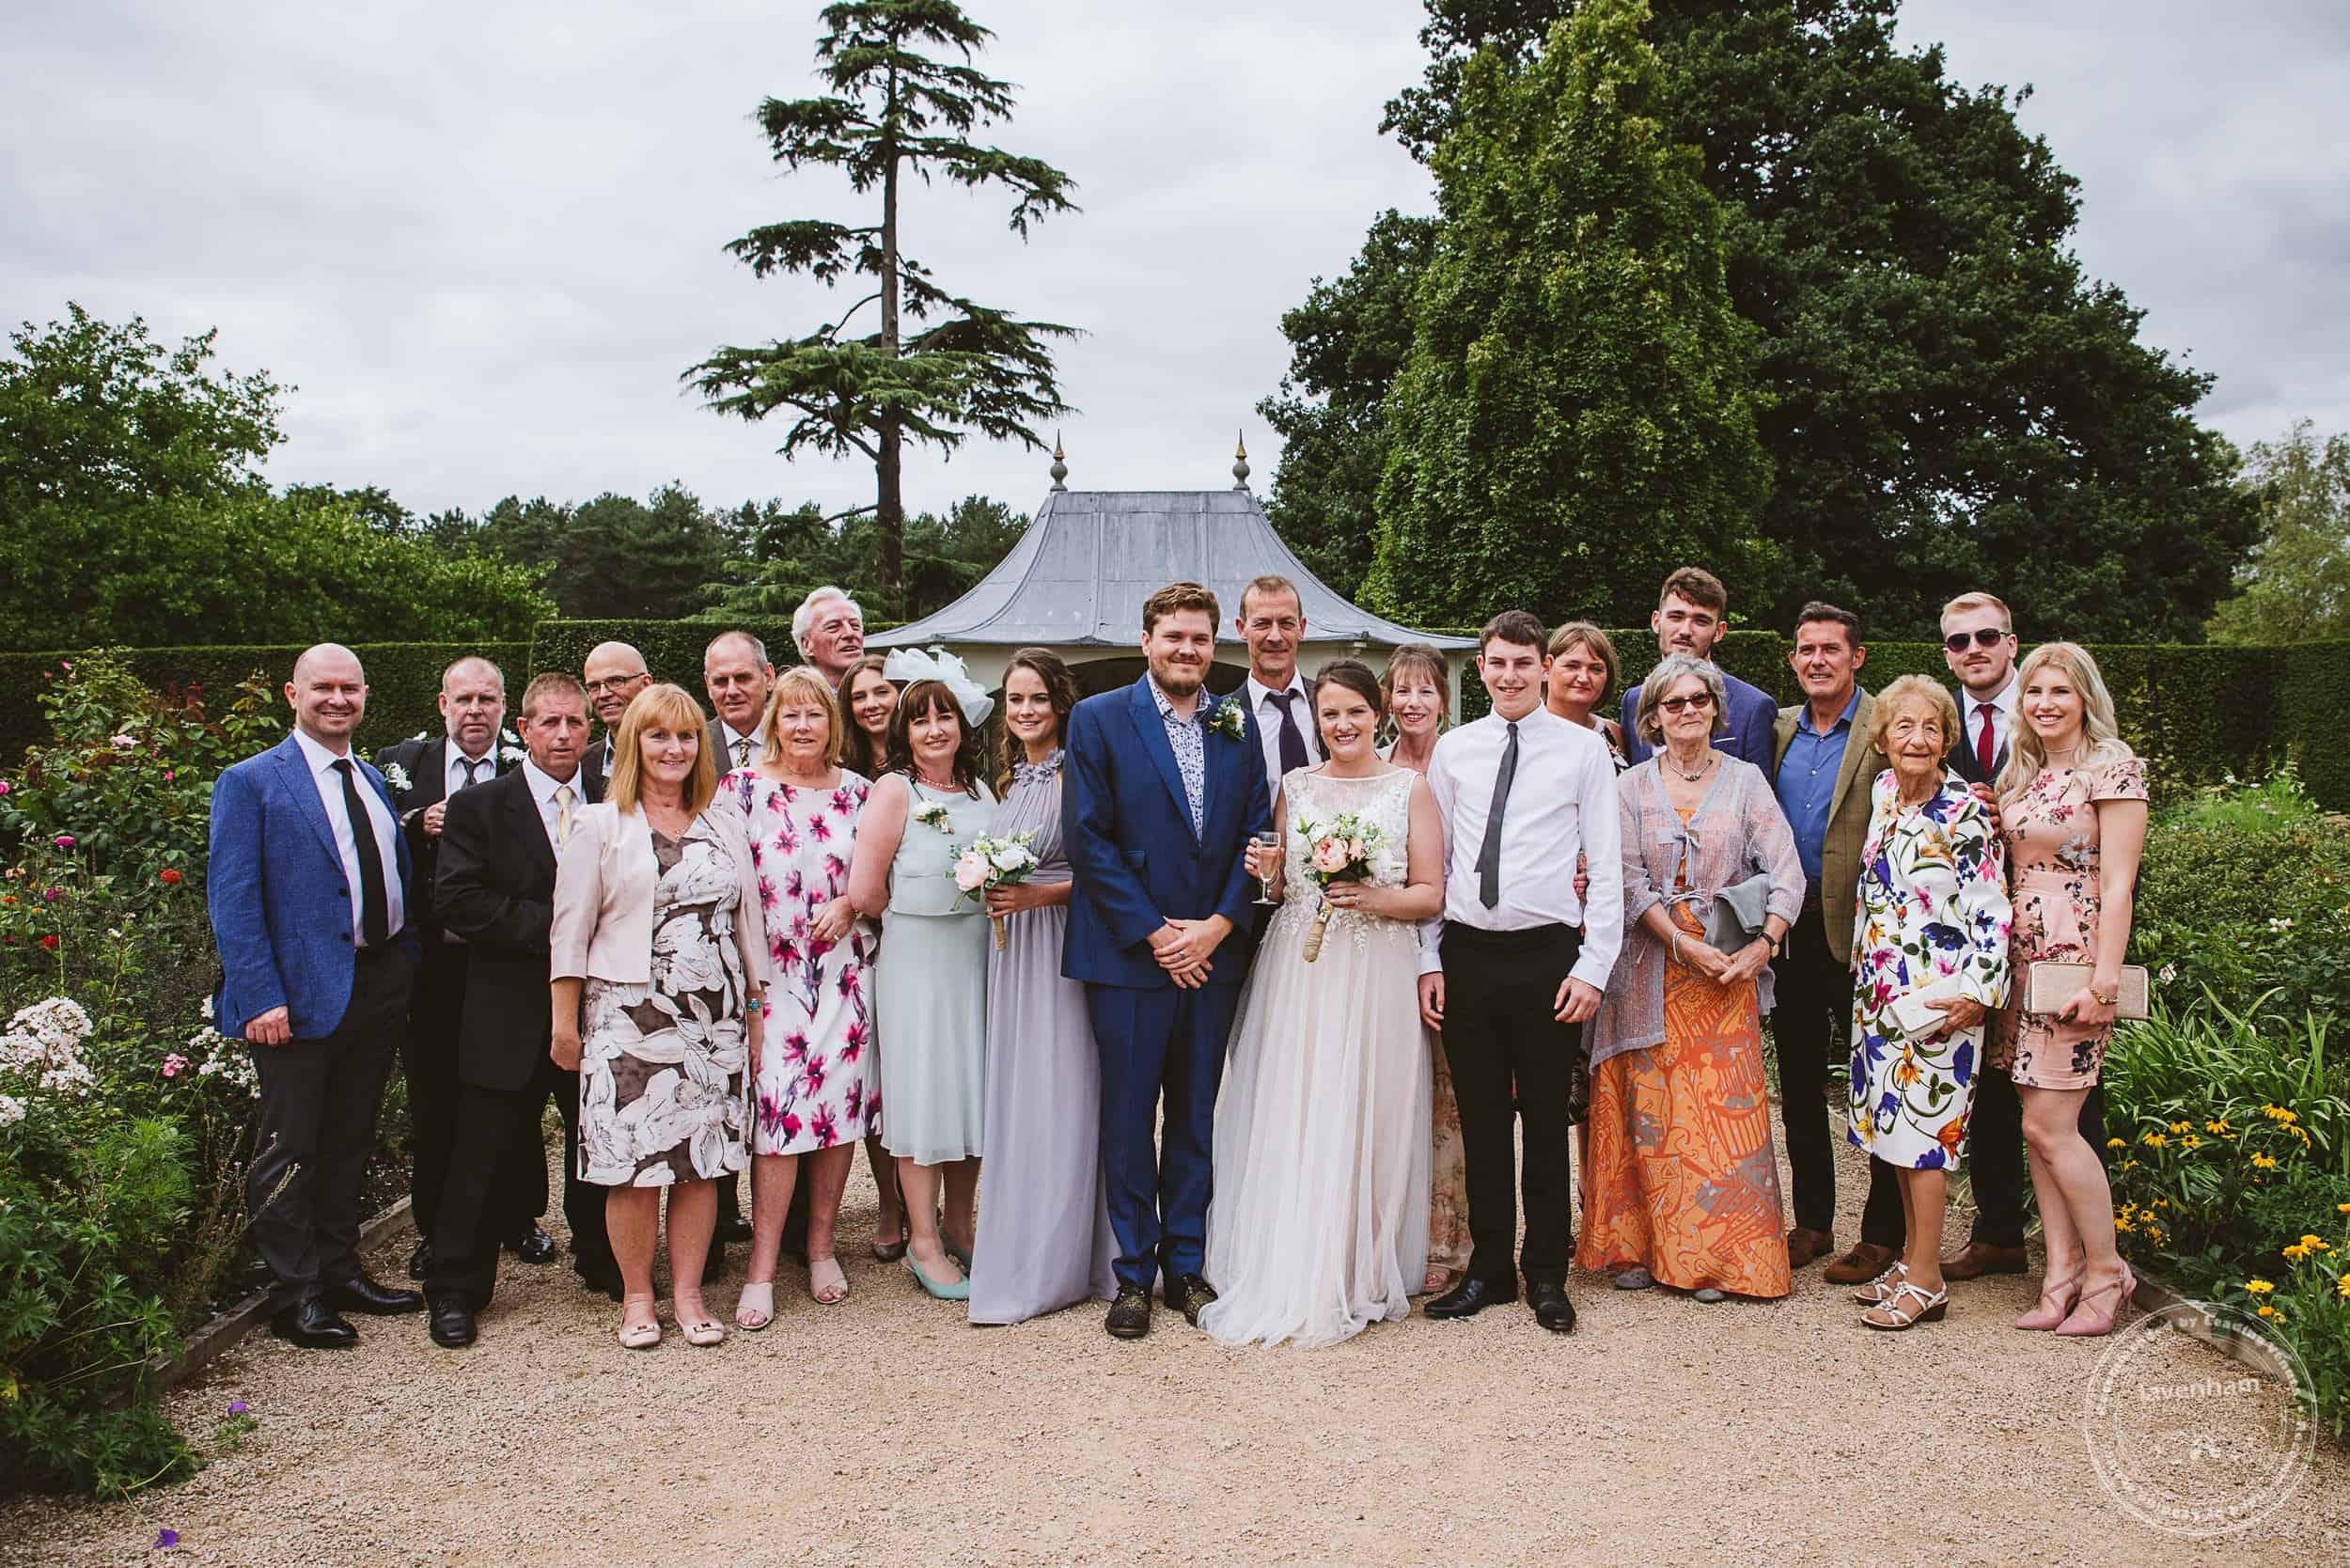 180818 Marks Hall Wedding Photography Lavenham Photographic 111